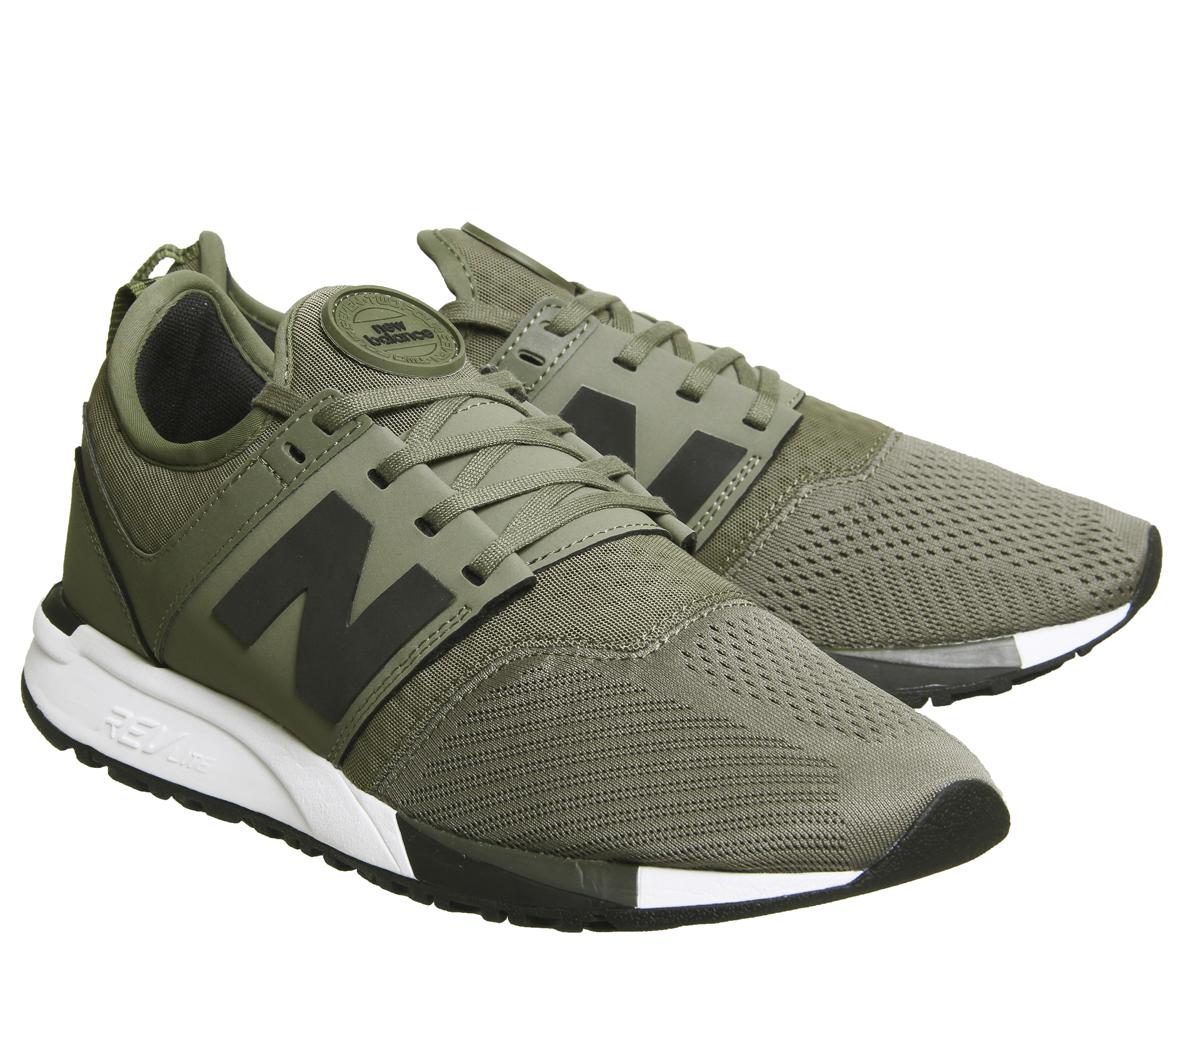 ff878880396 Para Hombre 247 tenis Oliva Tenis New Balance Zapatos